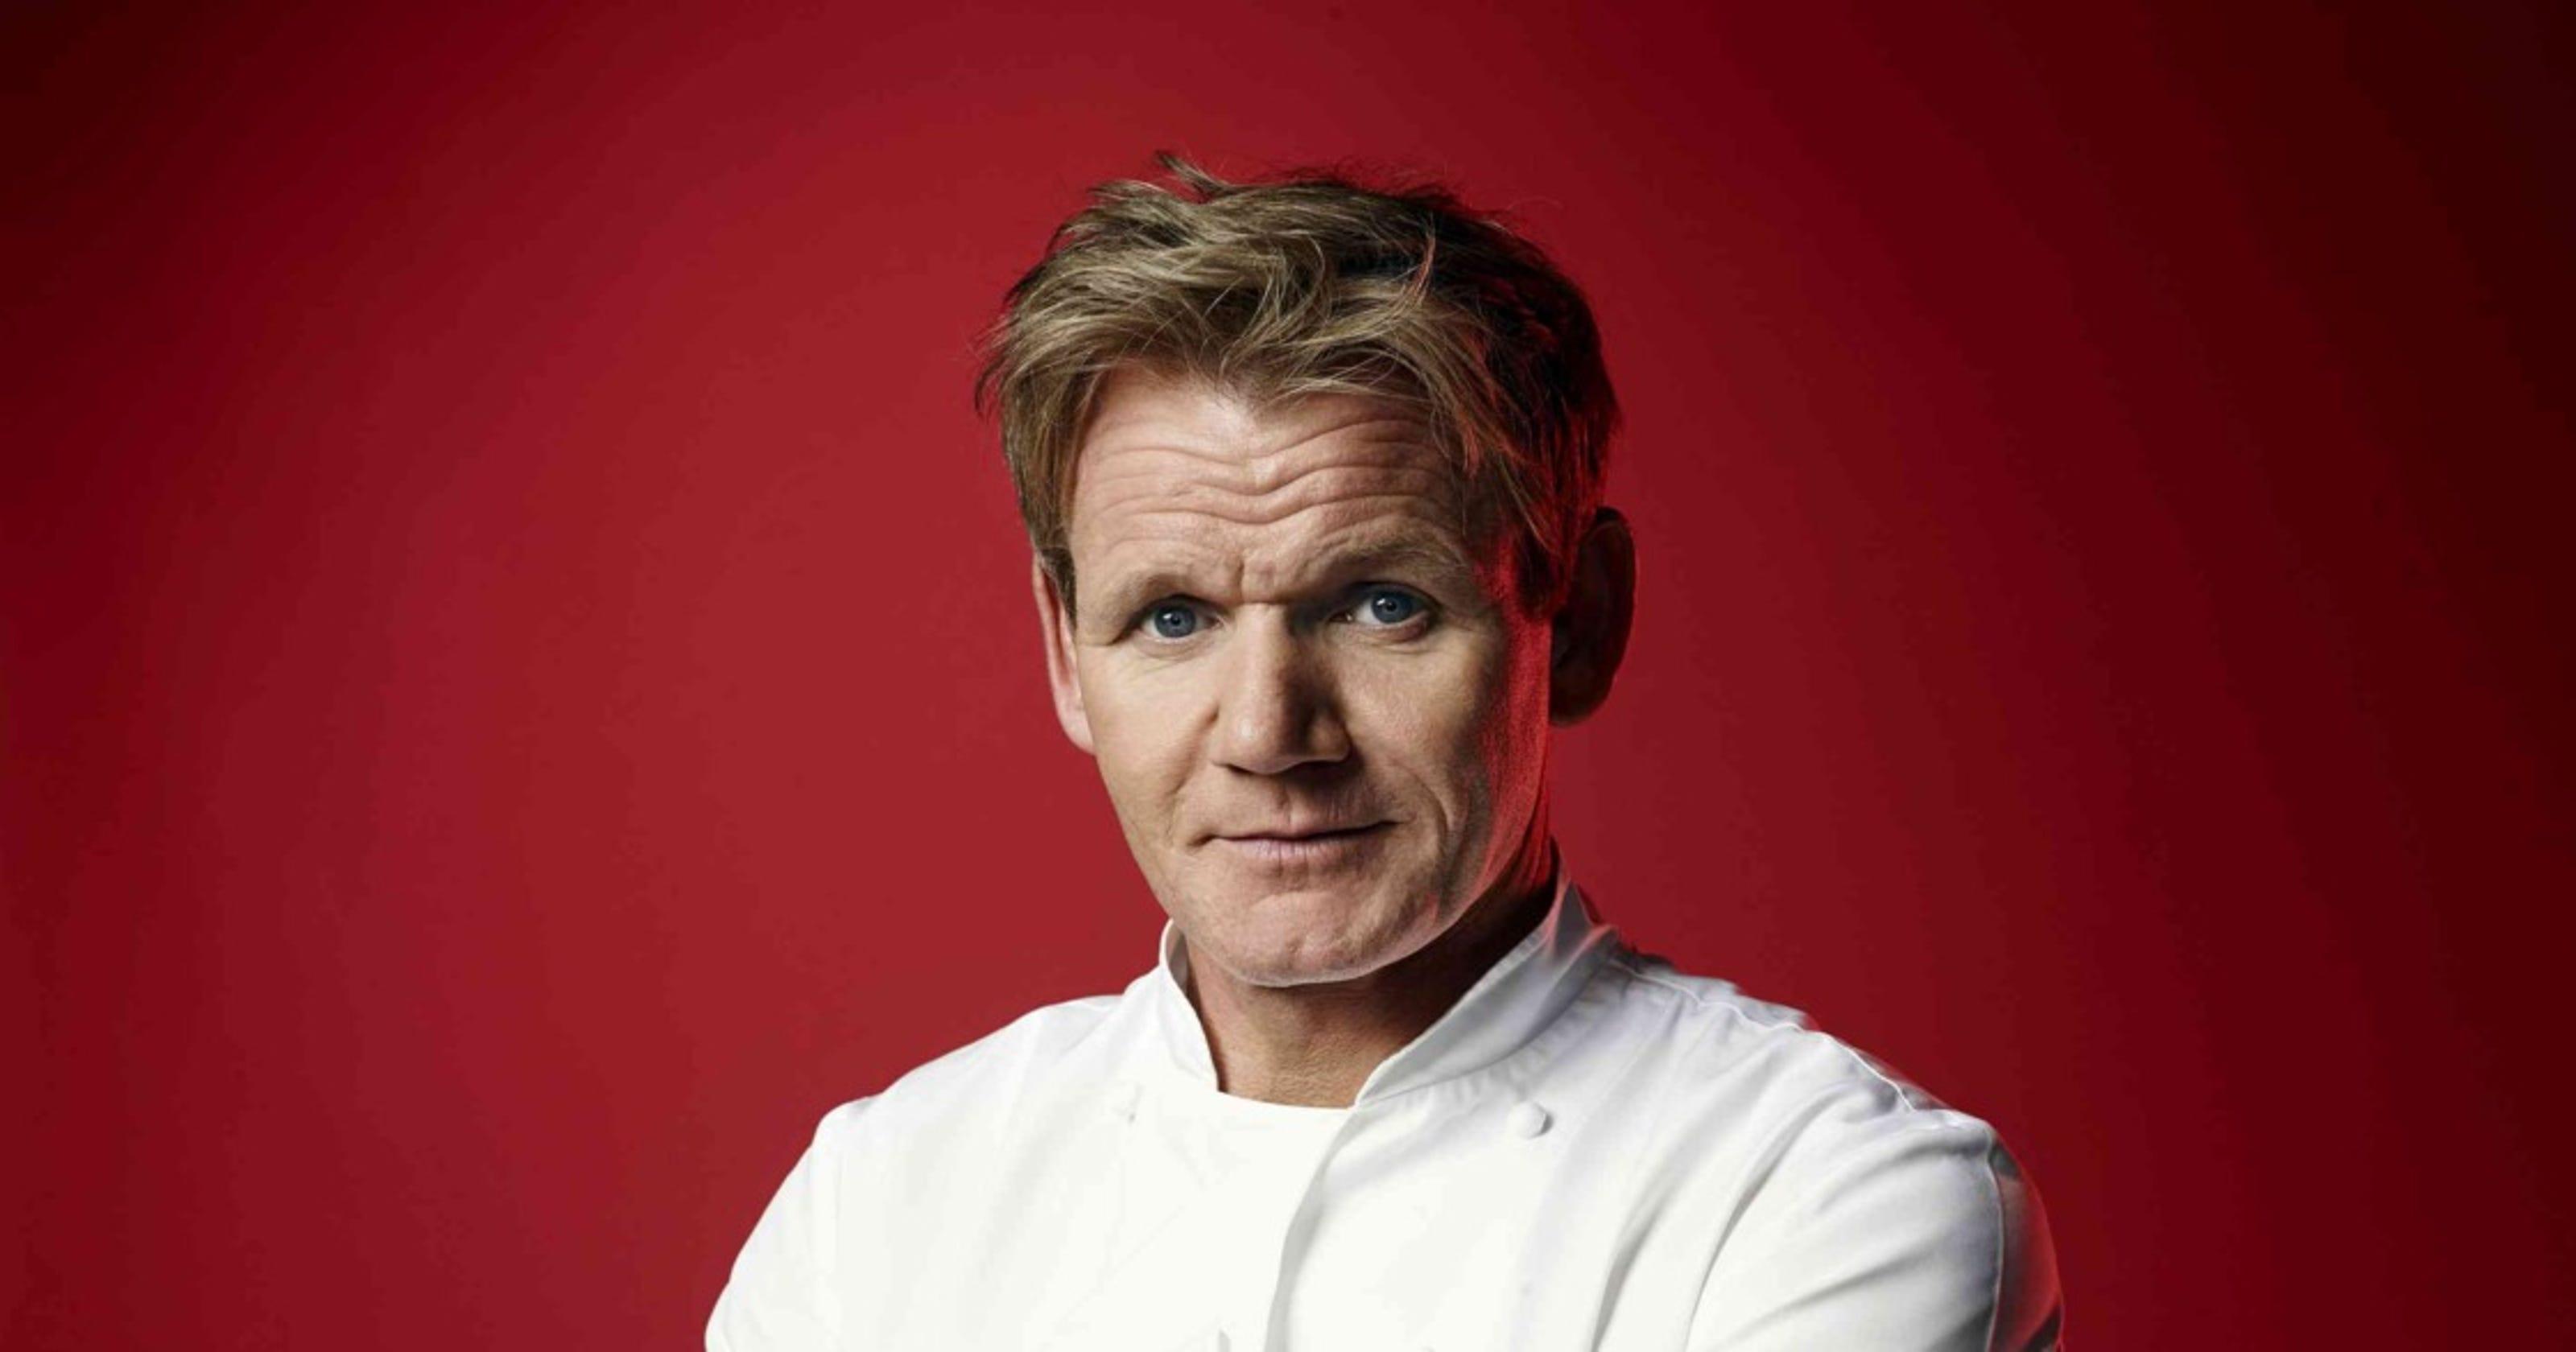 Are Gordon Ramsay's next stops Cherry Hill and Swedesboro?